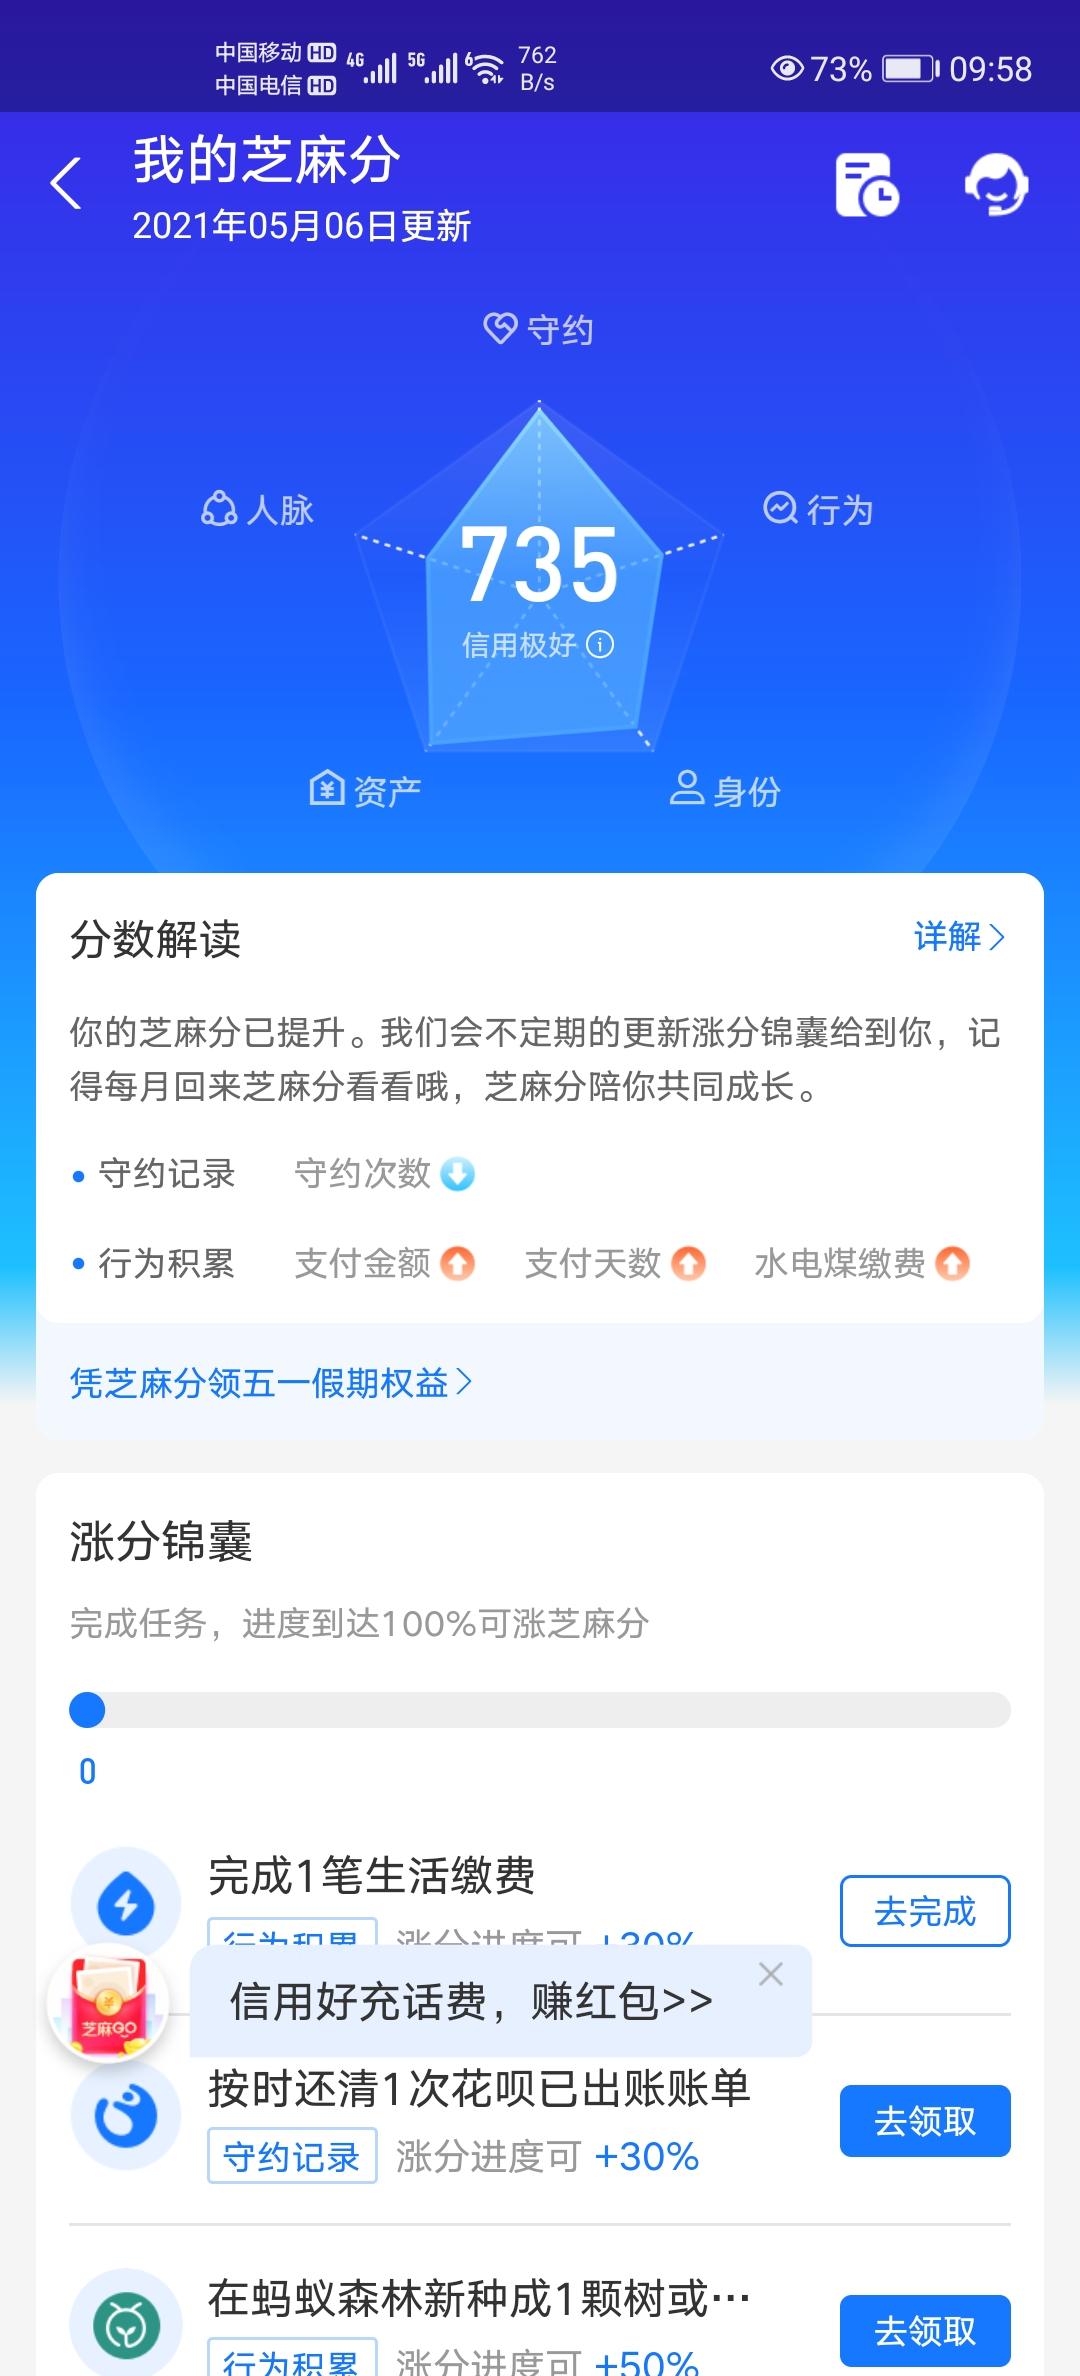 Screenshot_20210506_095843_com.eg.android.AlipayGphone.jpg